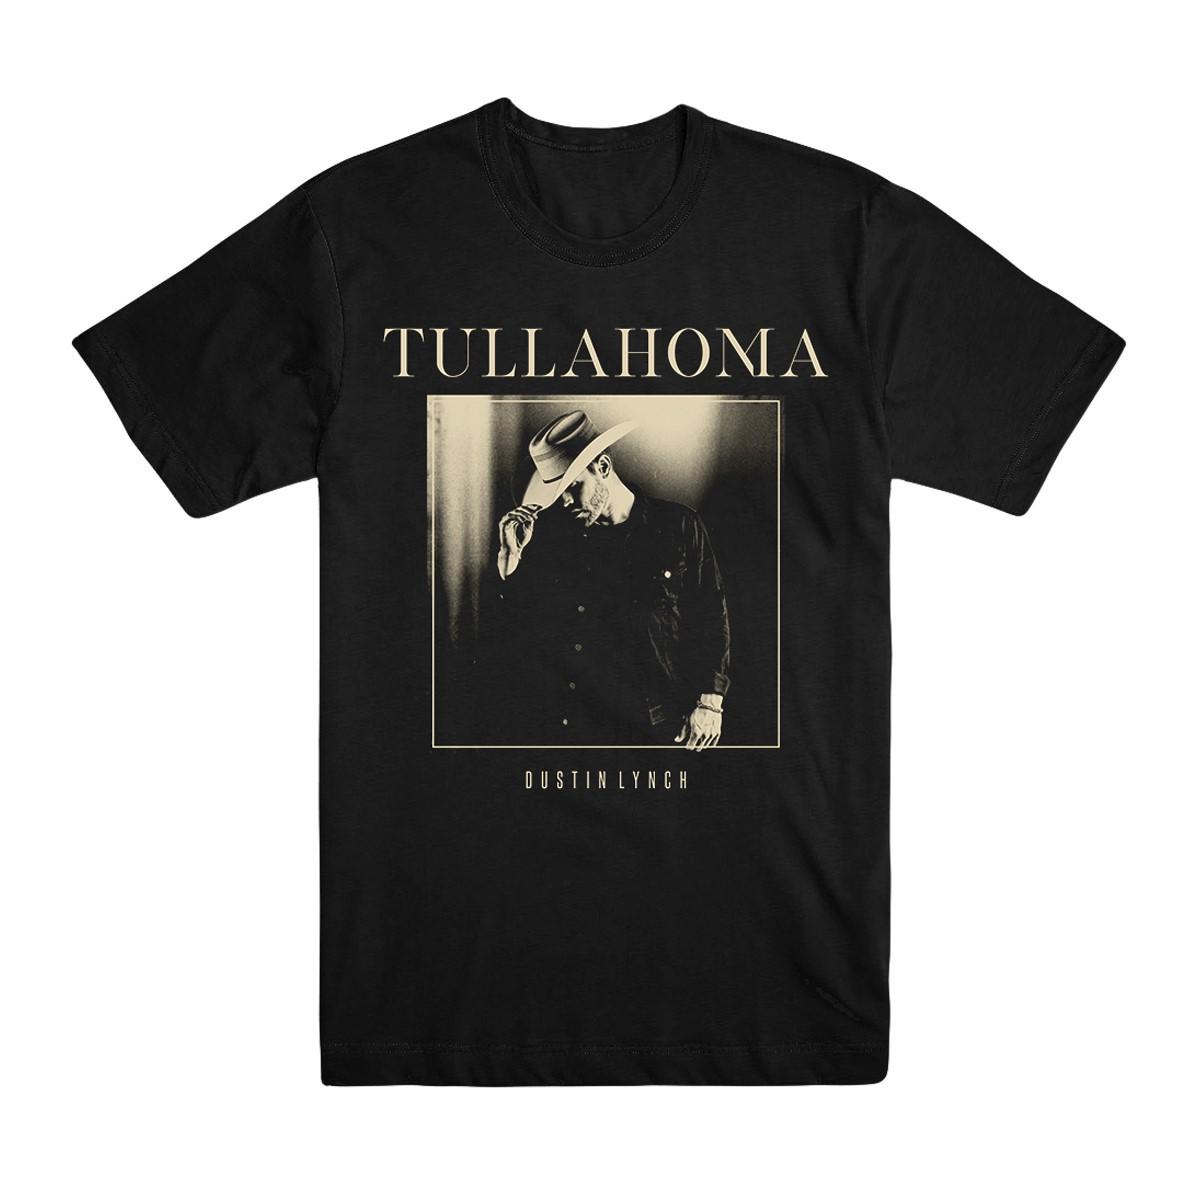 Tullahoma T-shirt